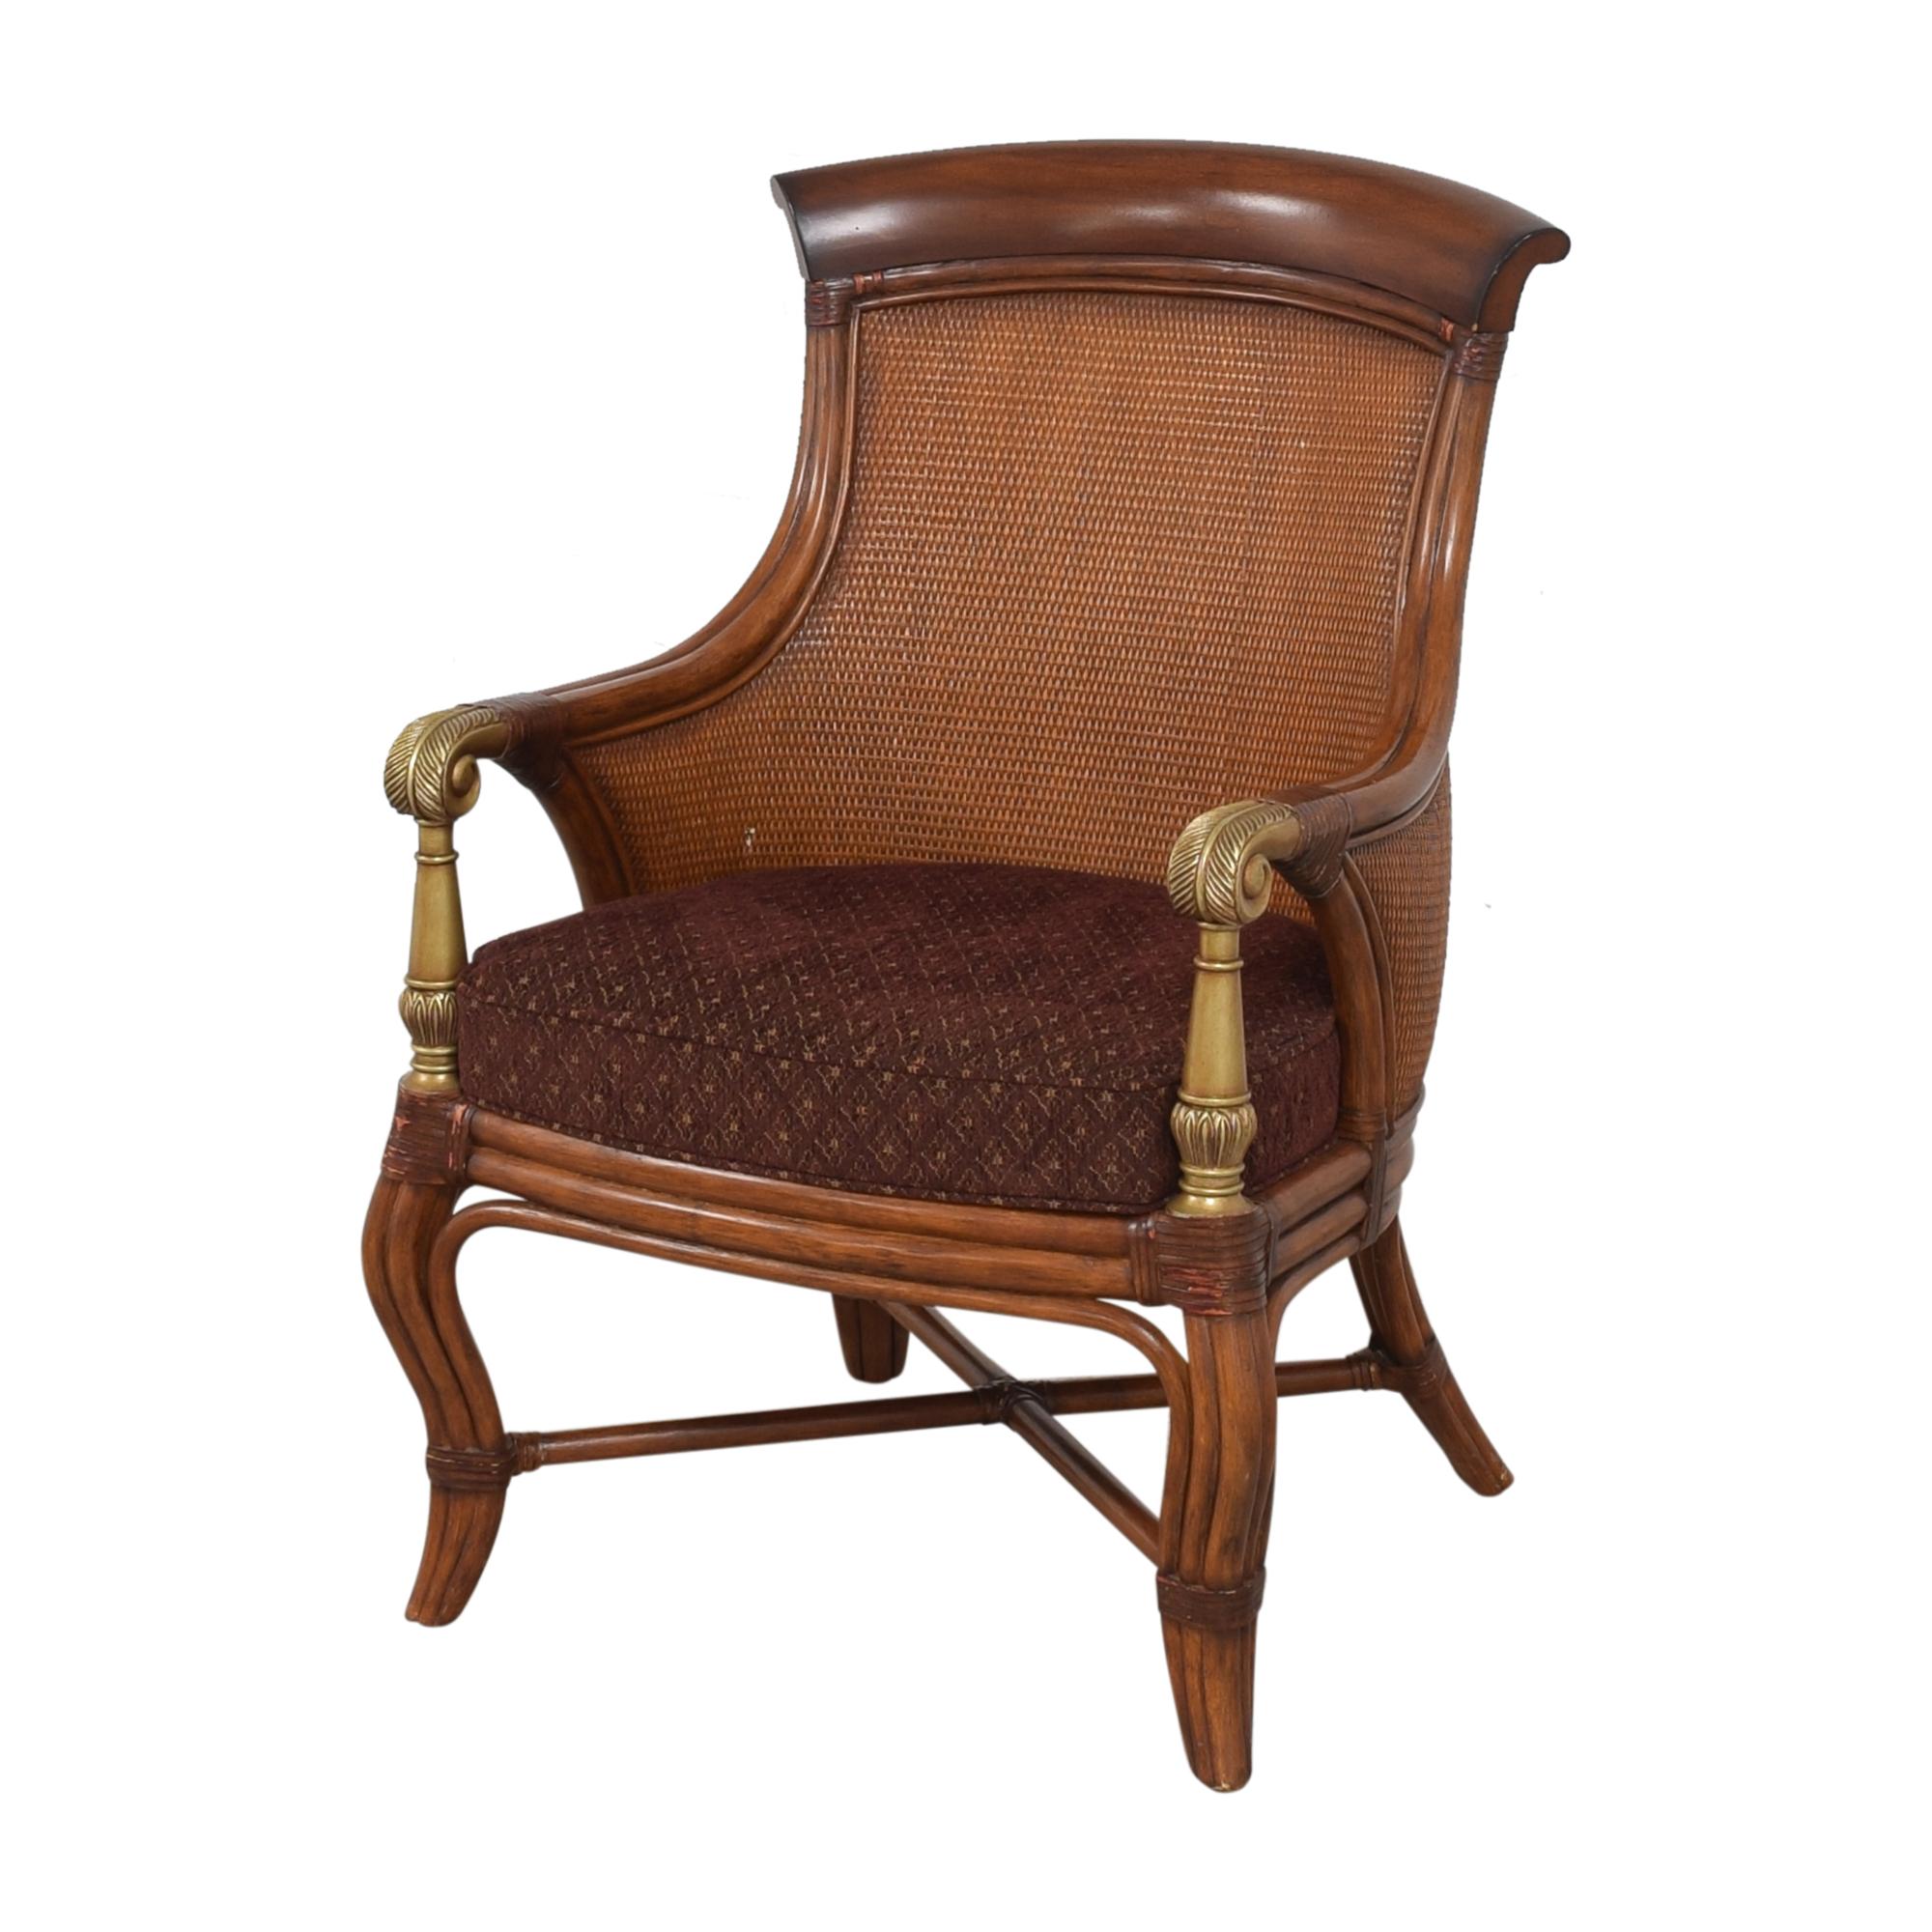 Ethan Allen Ethan Allen Bermuda Chair for sale